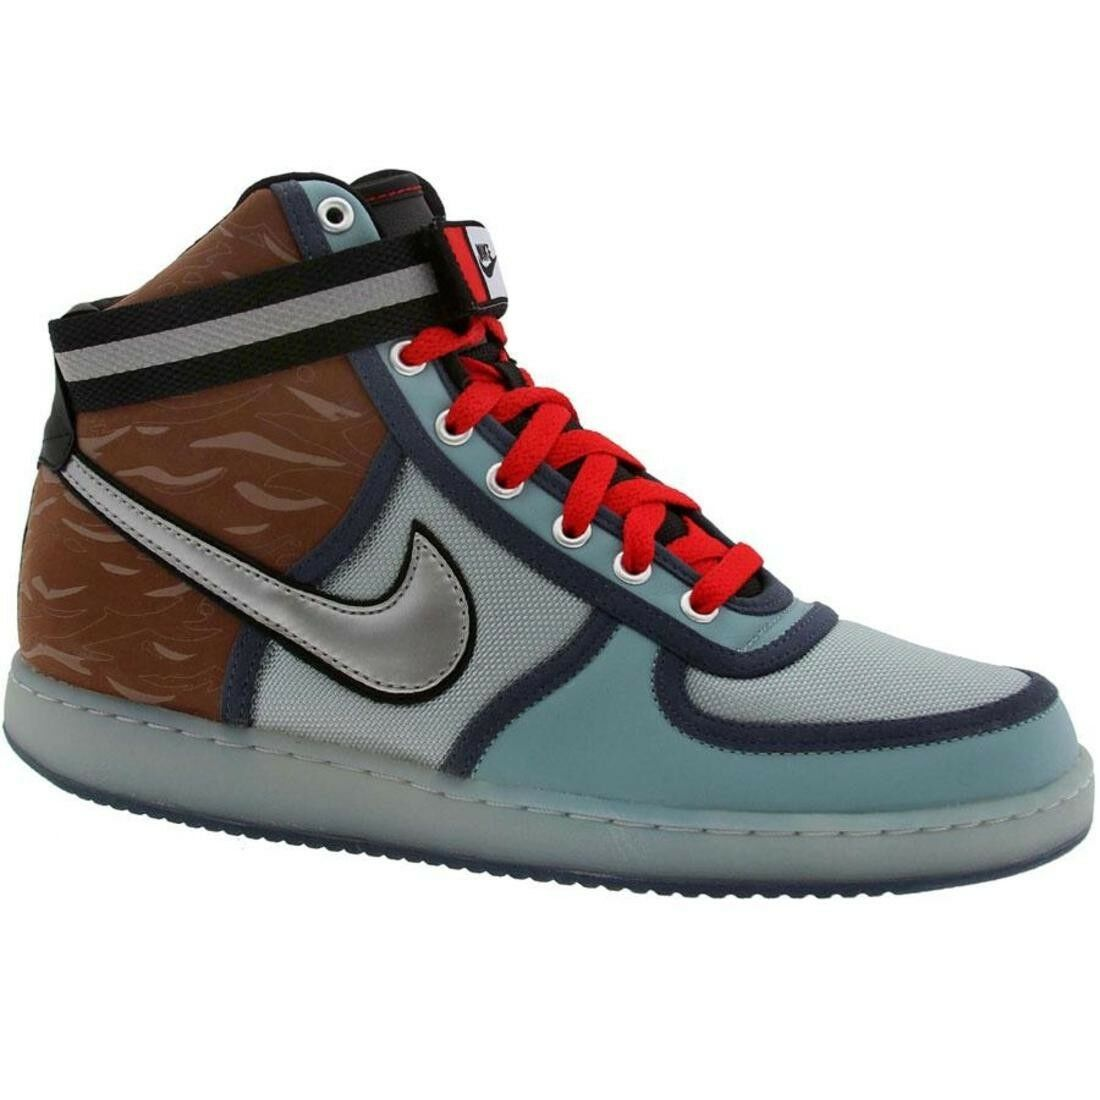 317302-401 Nike Vandal High Army Premium Quickstrike - Army High Pack Blue Haze a780dc